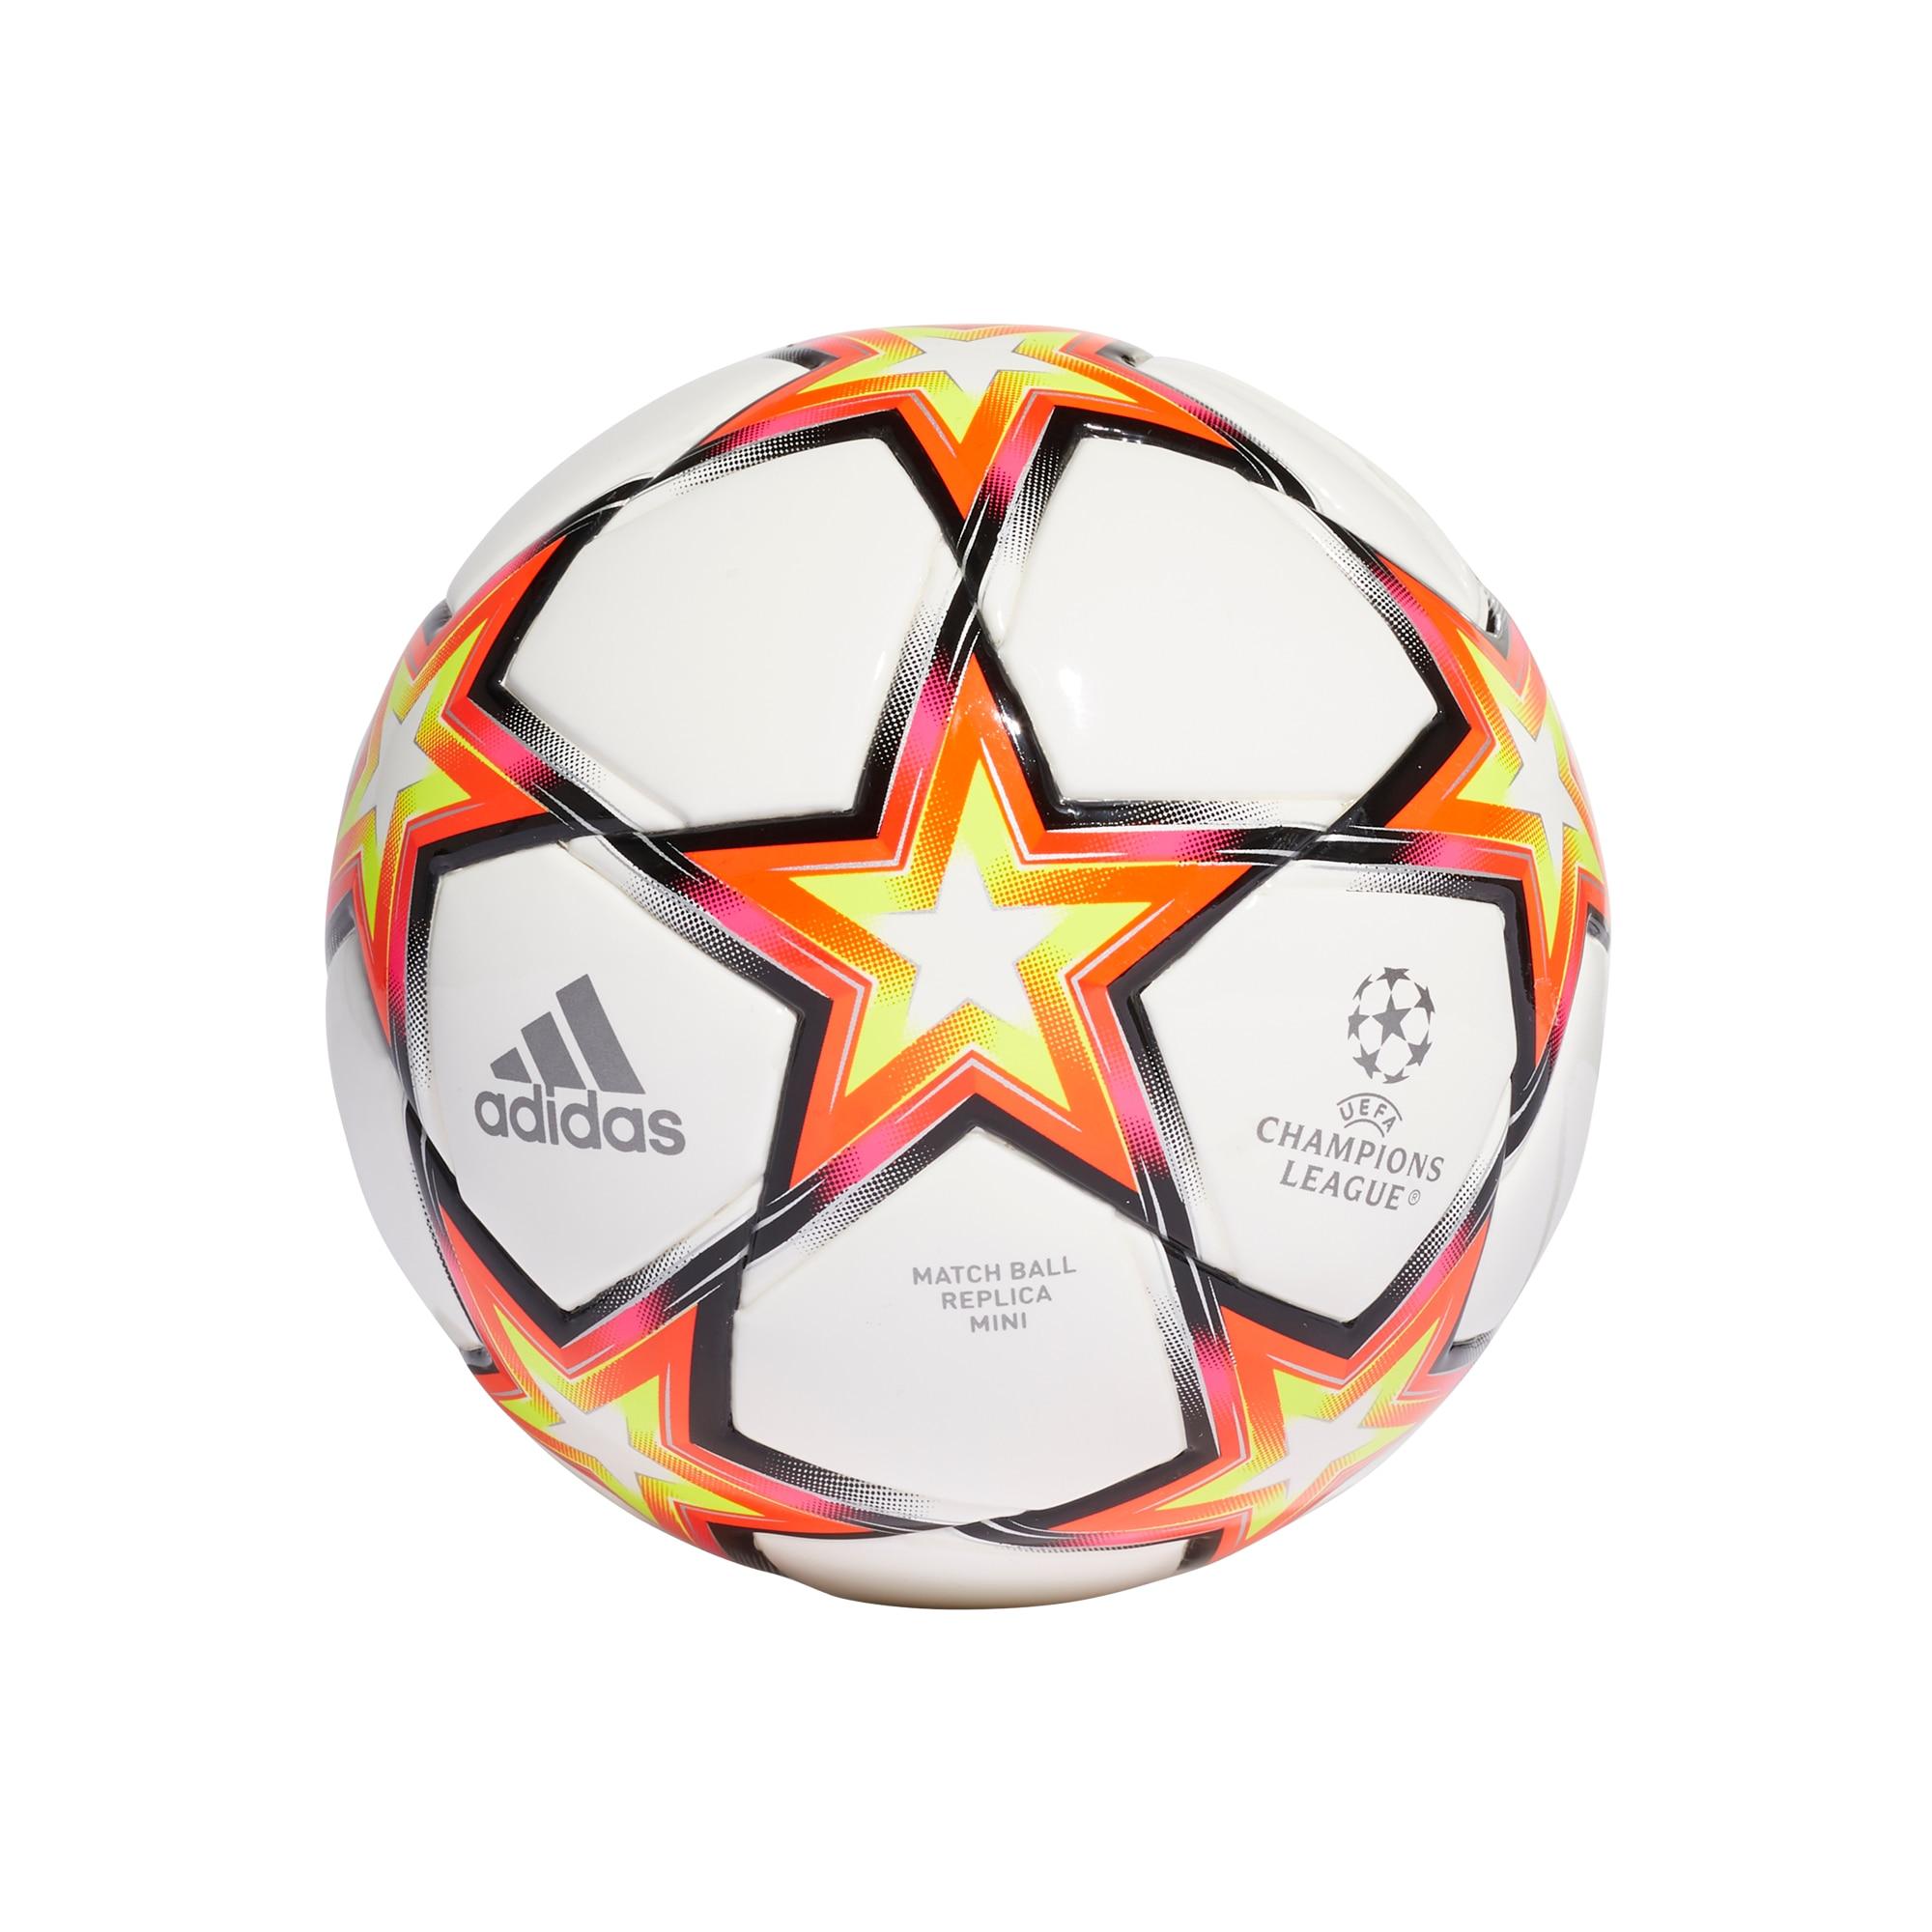 Adidas Champions League Mini Fotball Trikseball 21/22